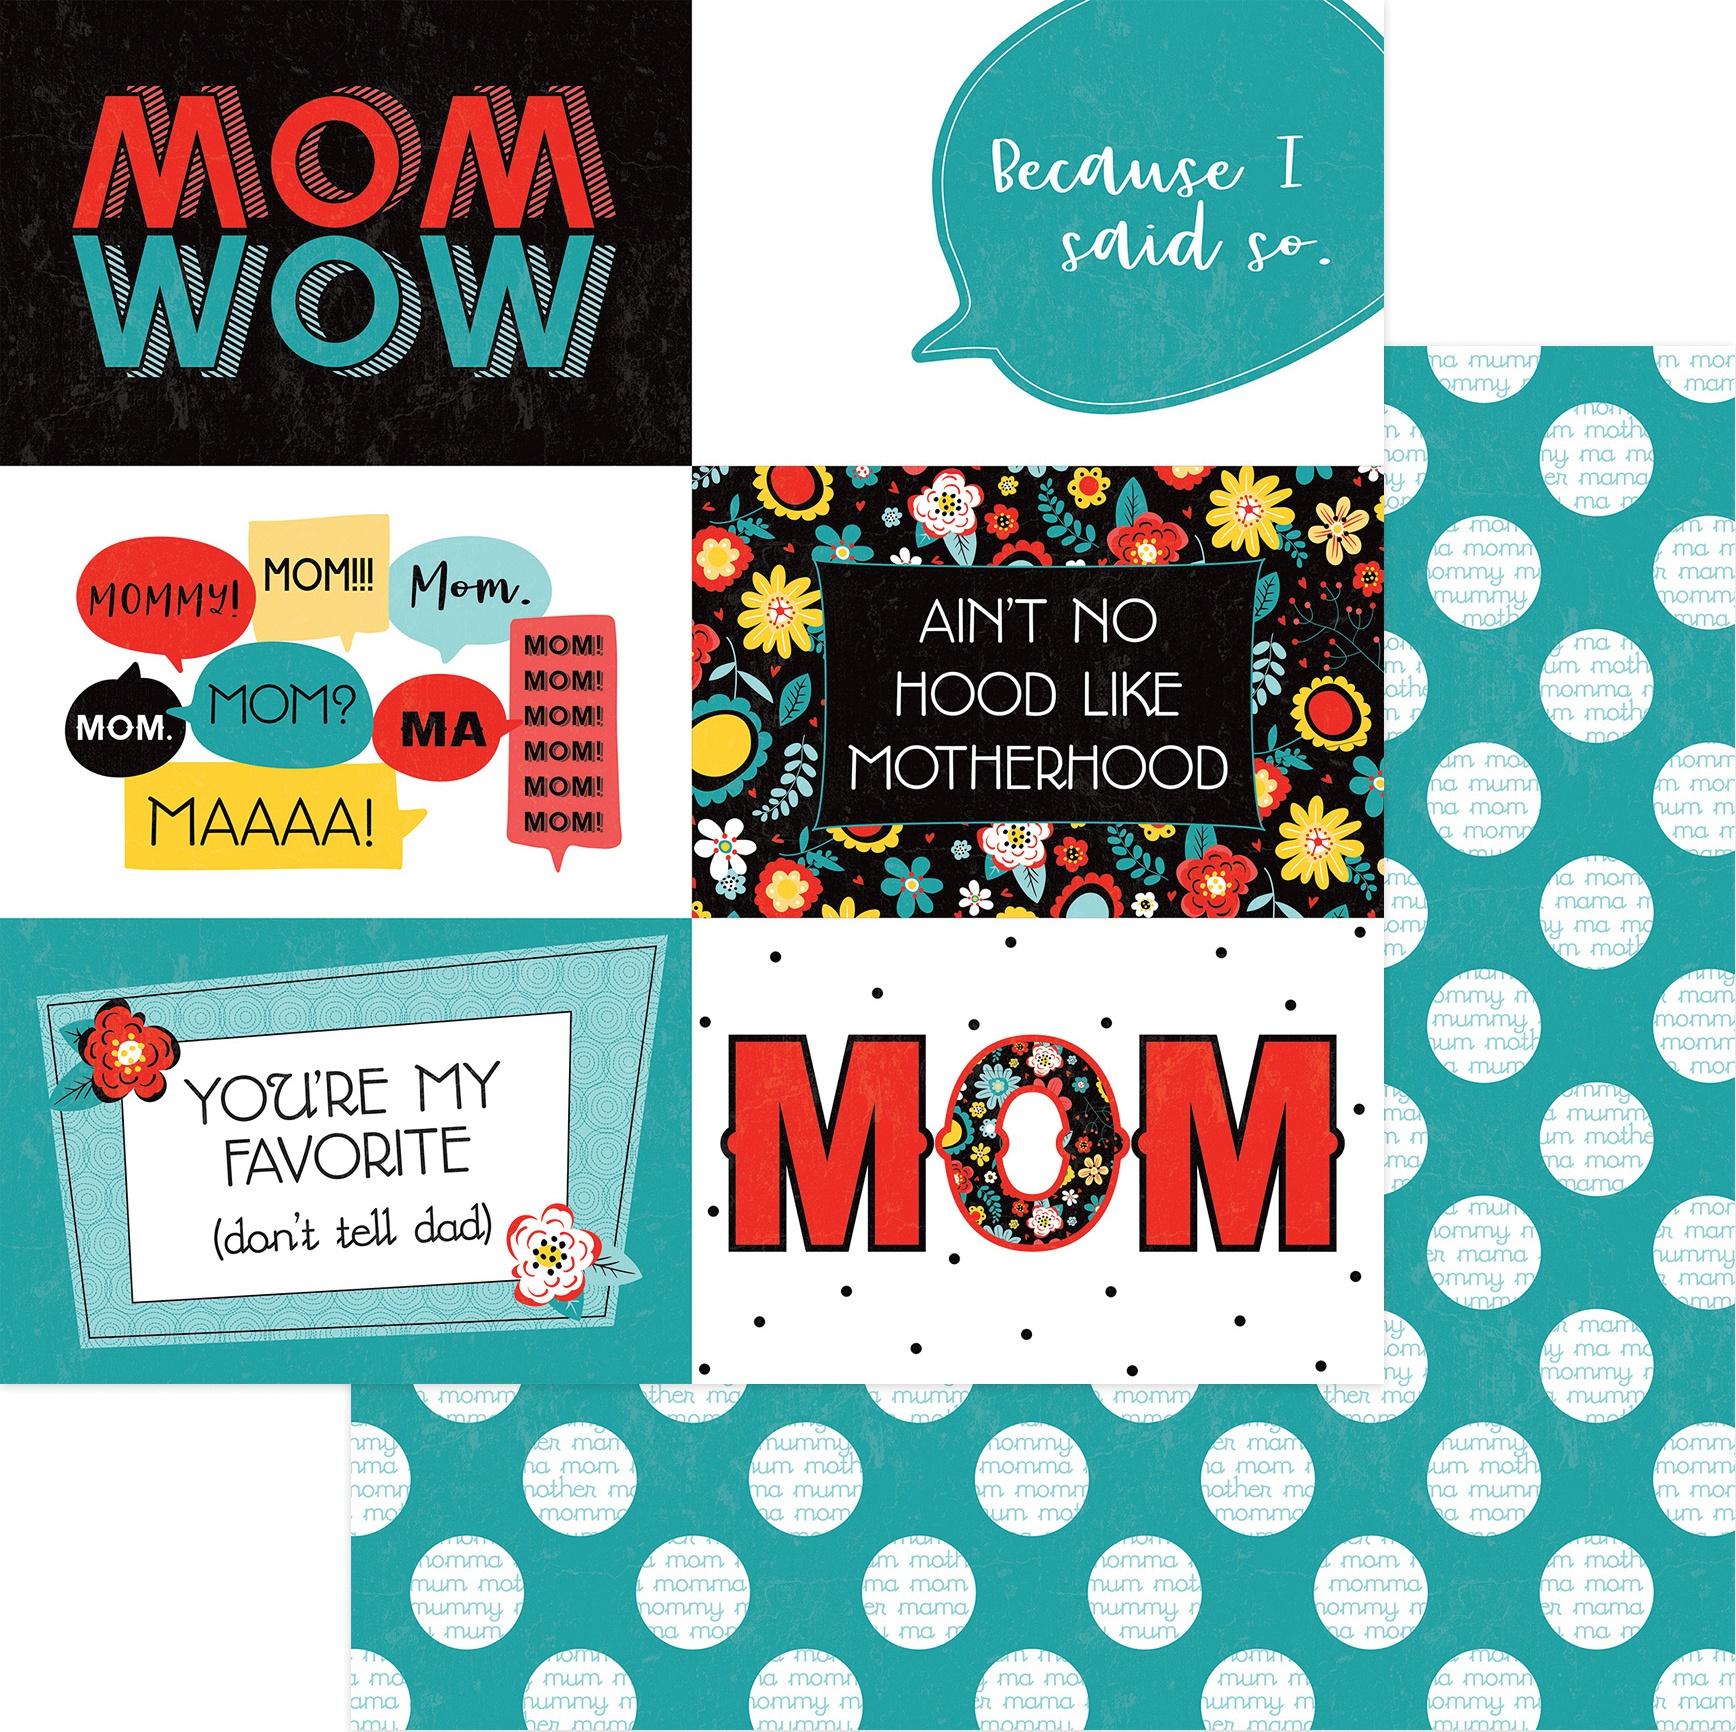 PPR - Best Mom Ever Because I Said So